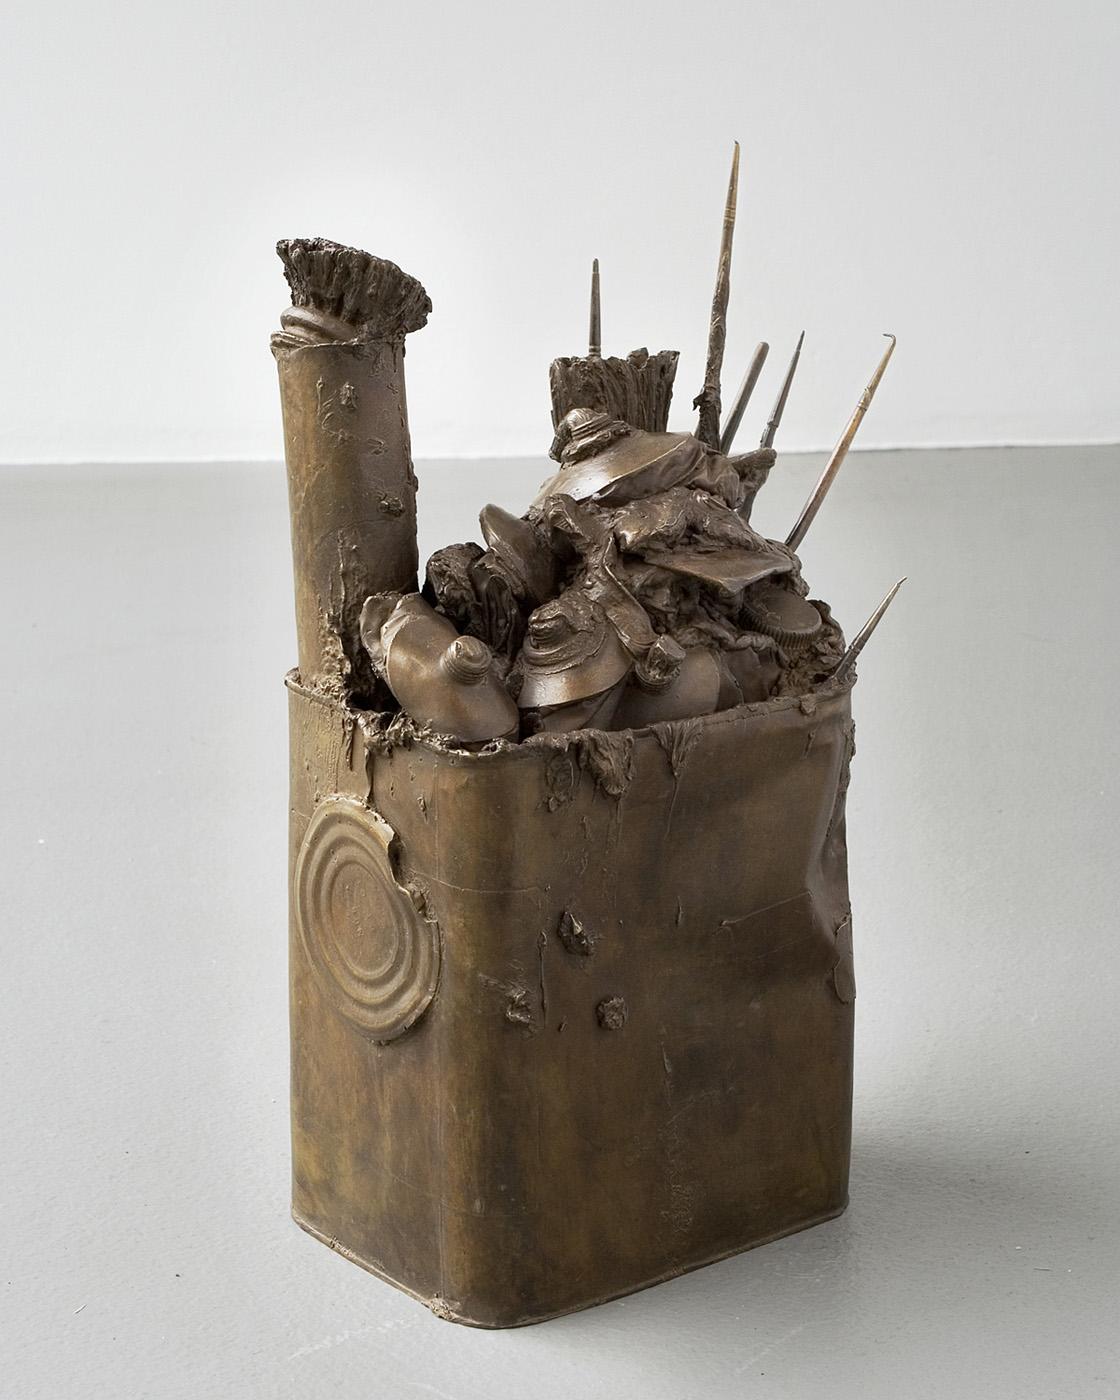 Ulrich Lamsfuss   ohne Titel (Spaltprodukt 4) , 2008 Bronze, artist's tools 13.58 x 8.86 x 5.31 inches (approx.) 34.5 x 22.5 x 13.5 cm